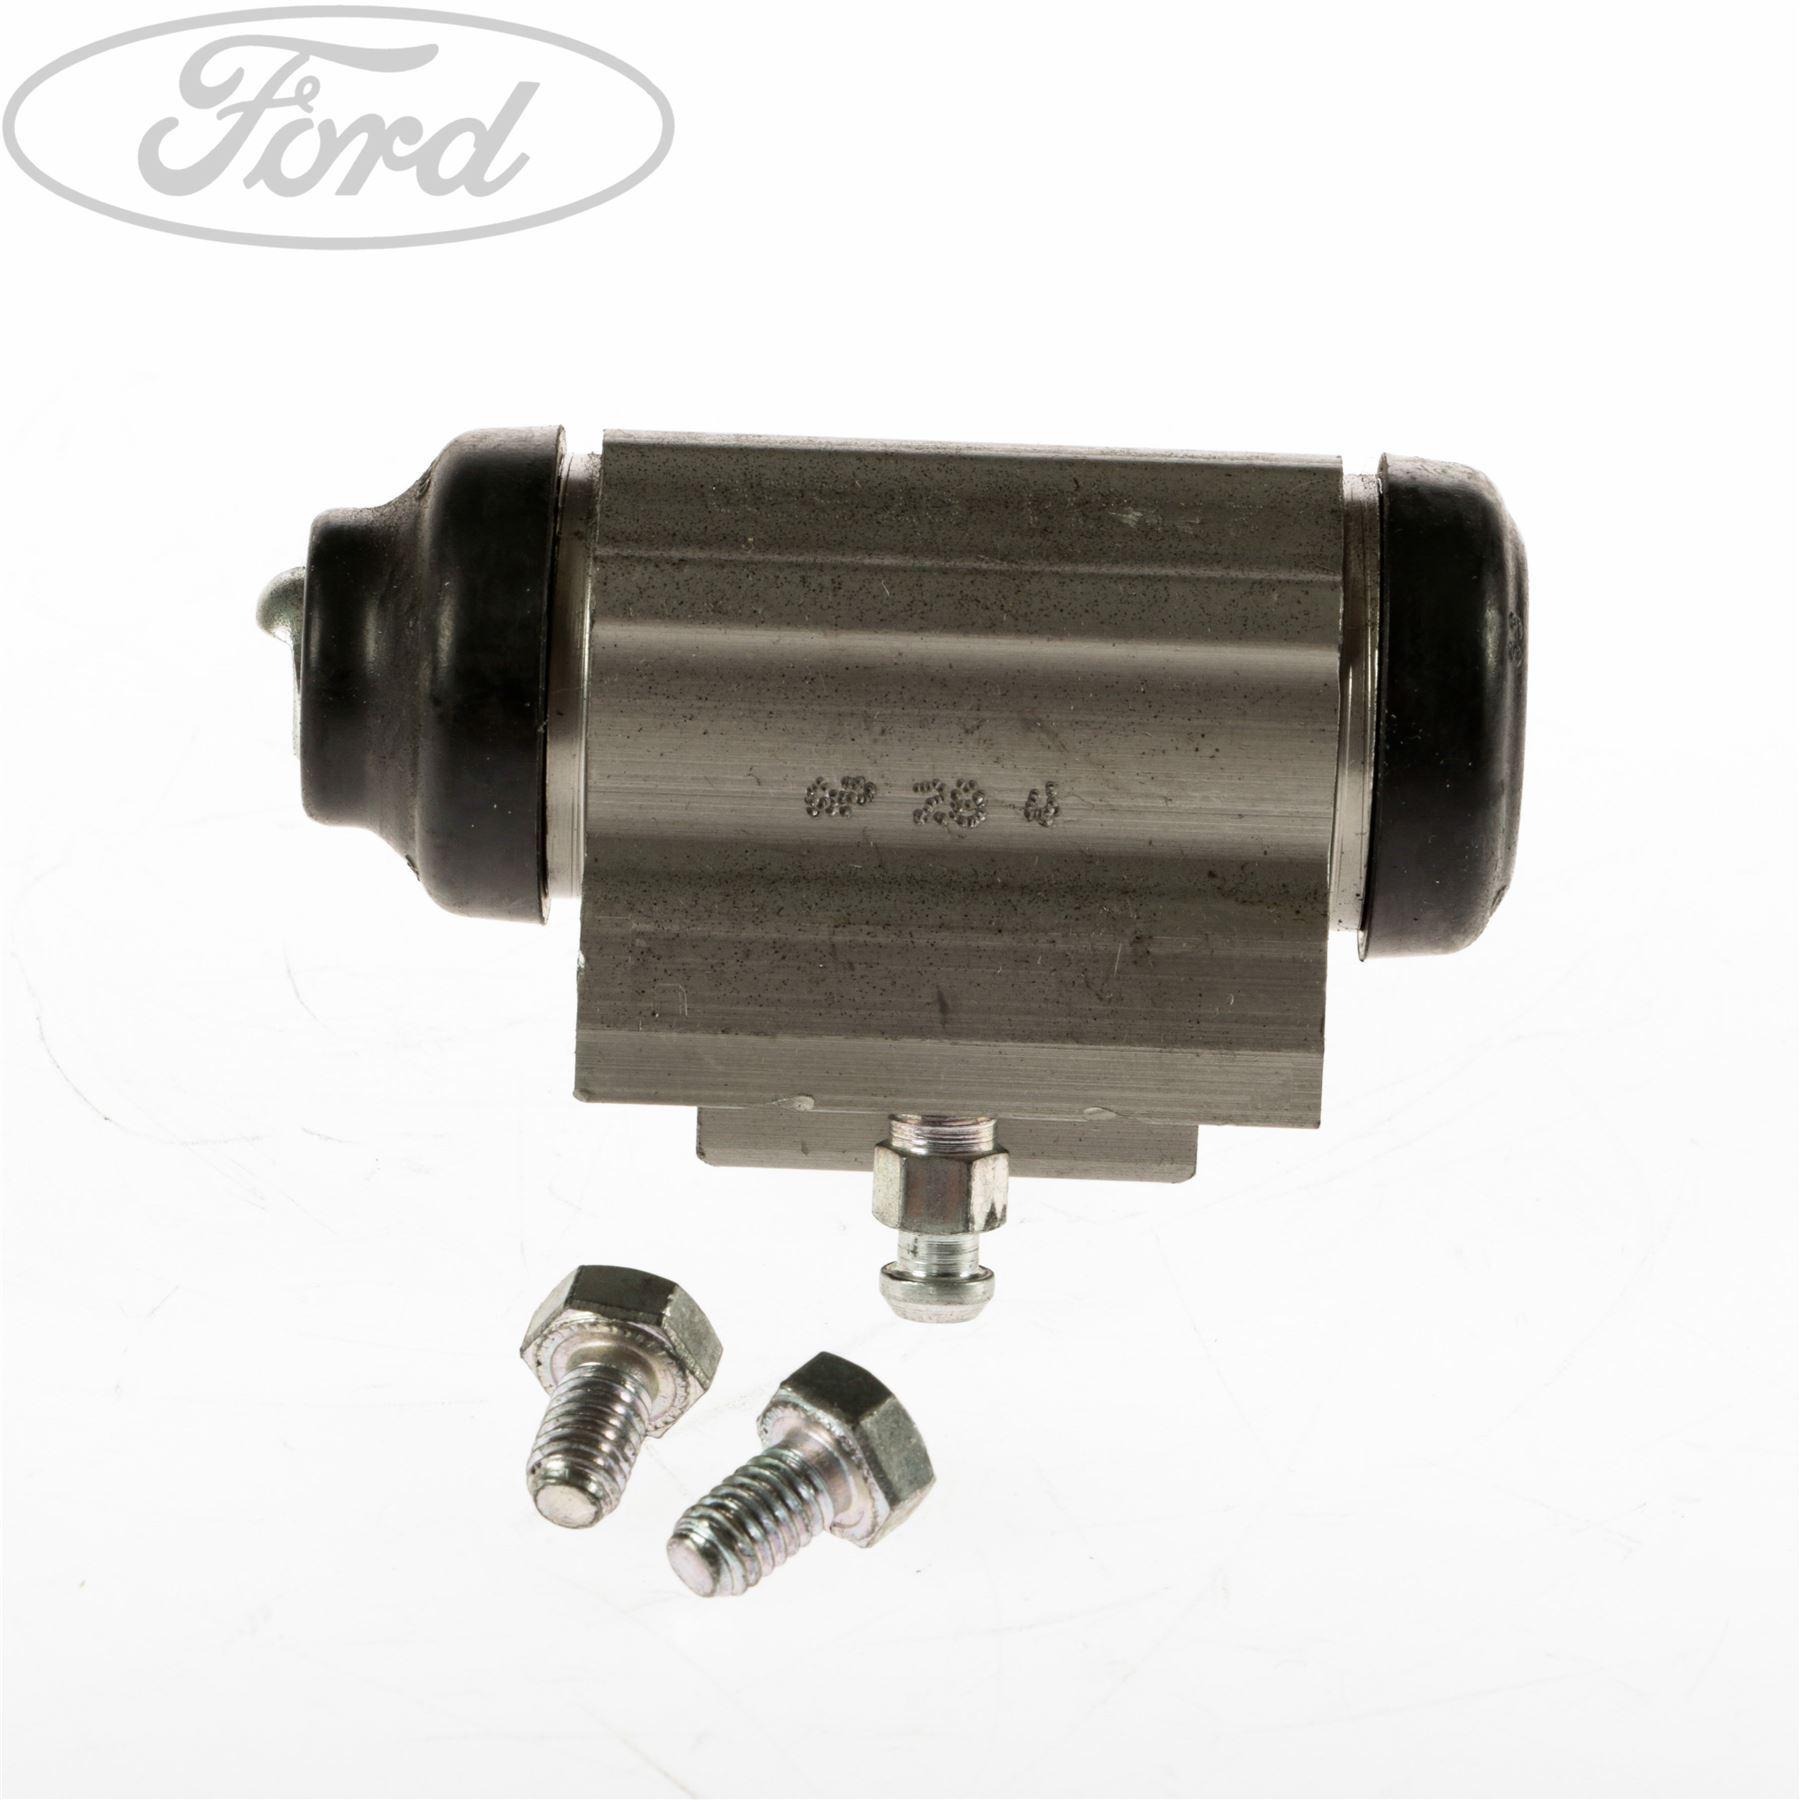 Fits Ford Cortina 2.0 Genuine OE Quality Apec Rear Wheel Brake Cylinder